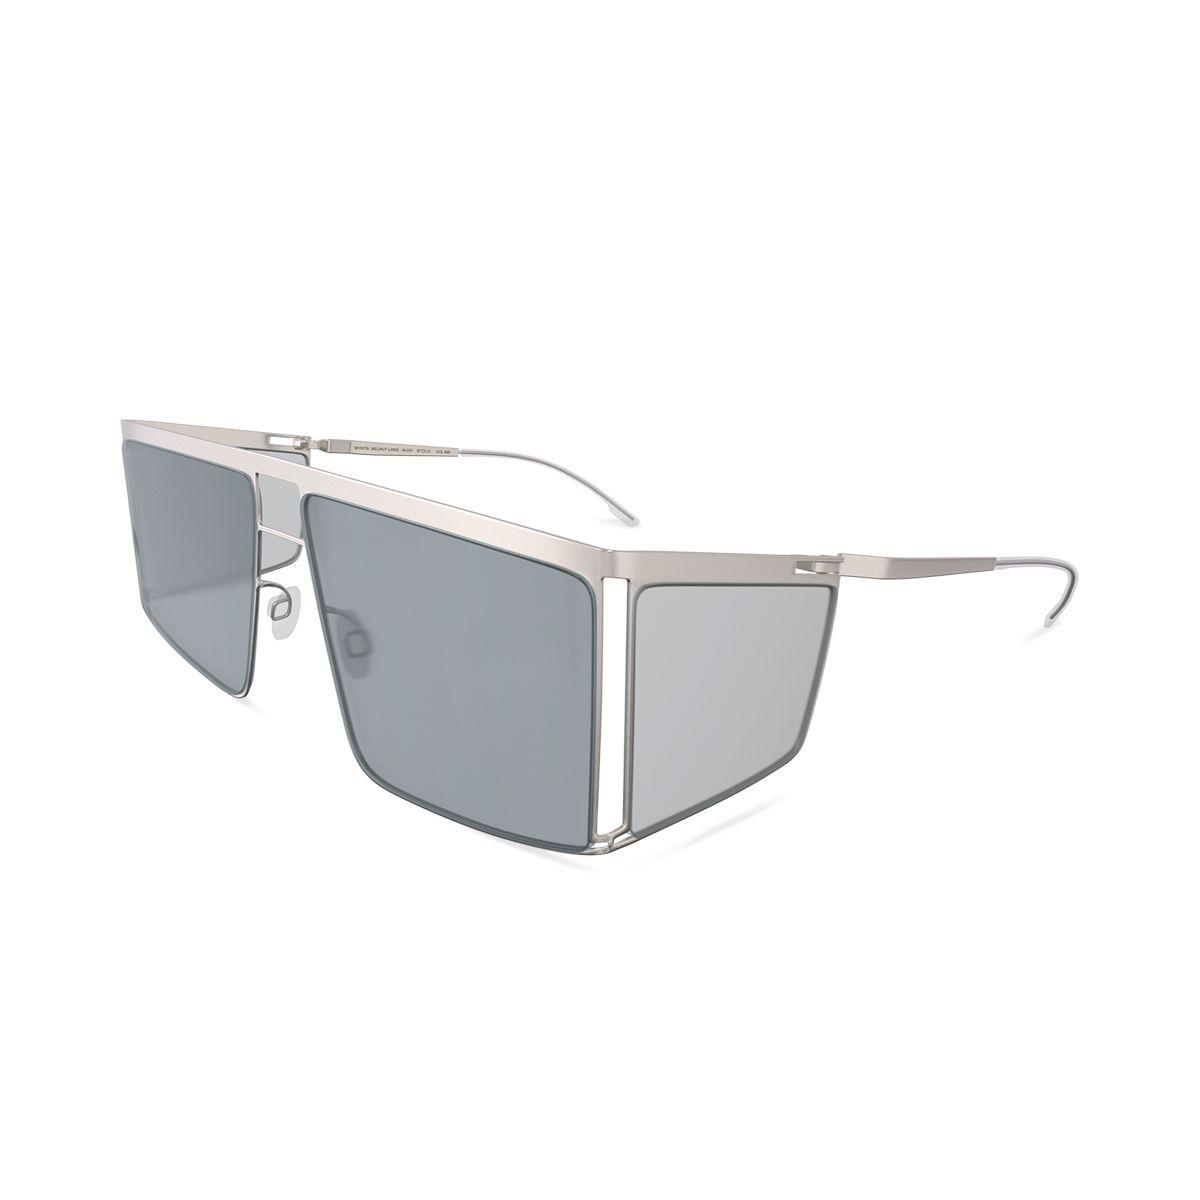 Mykita HL001 - Silver